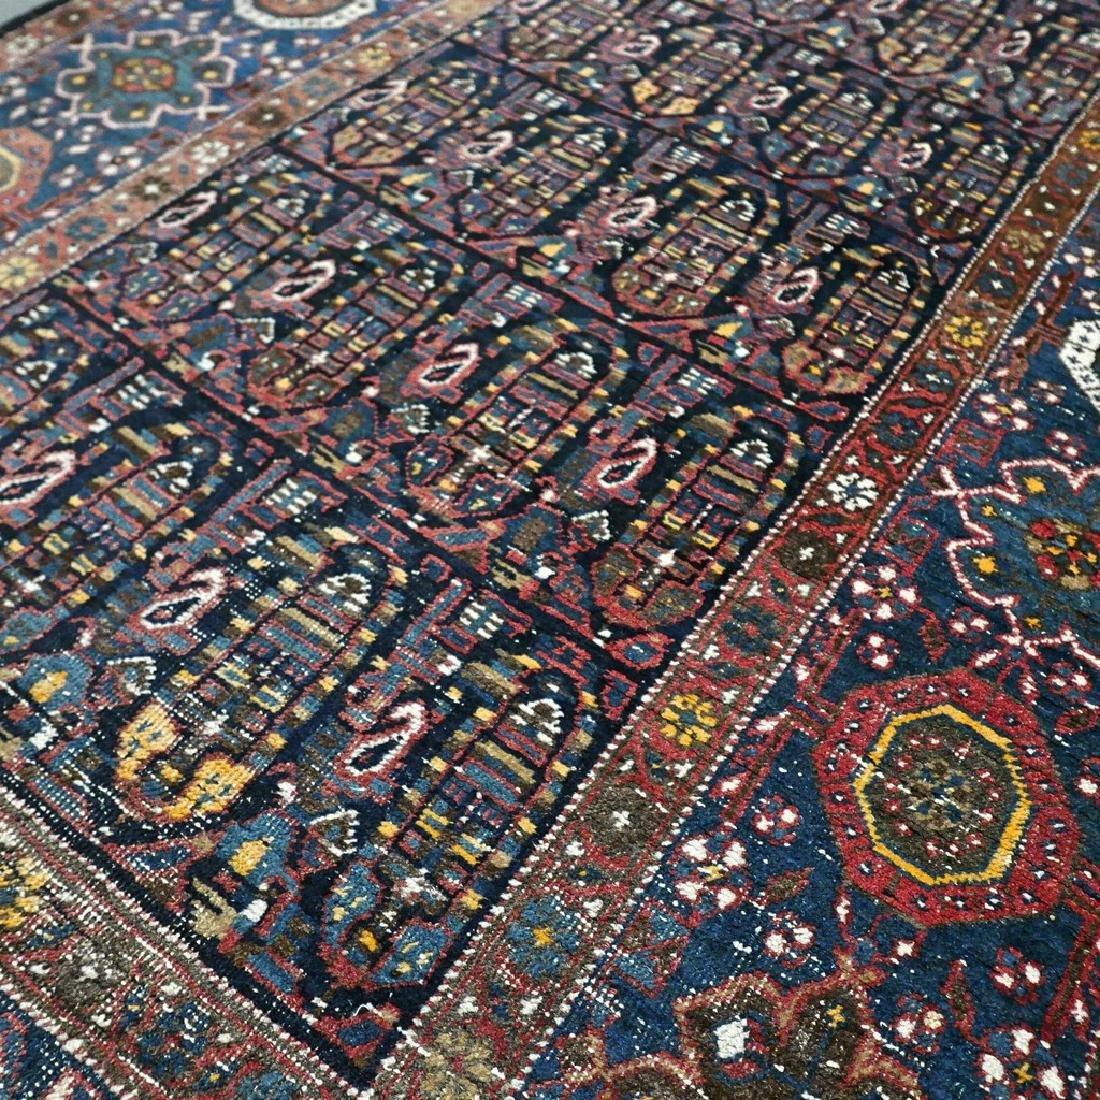 10.1x4.3 Antique Armenian boteh Kazak rug - 1880s - - 4